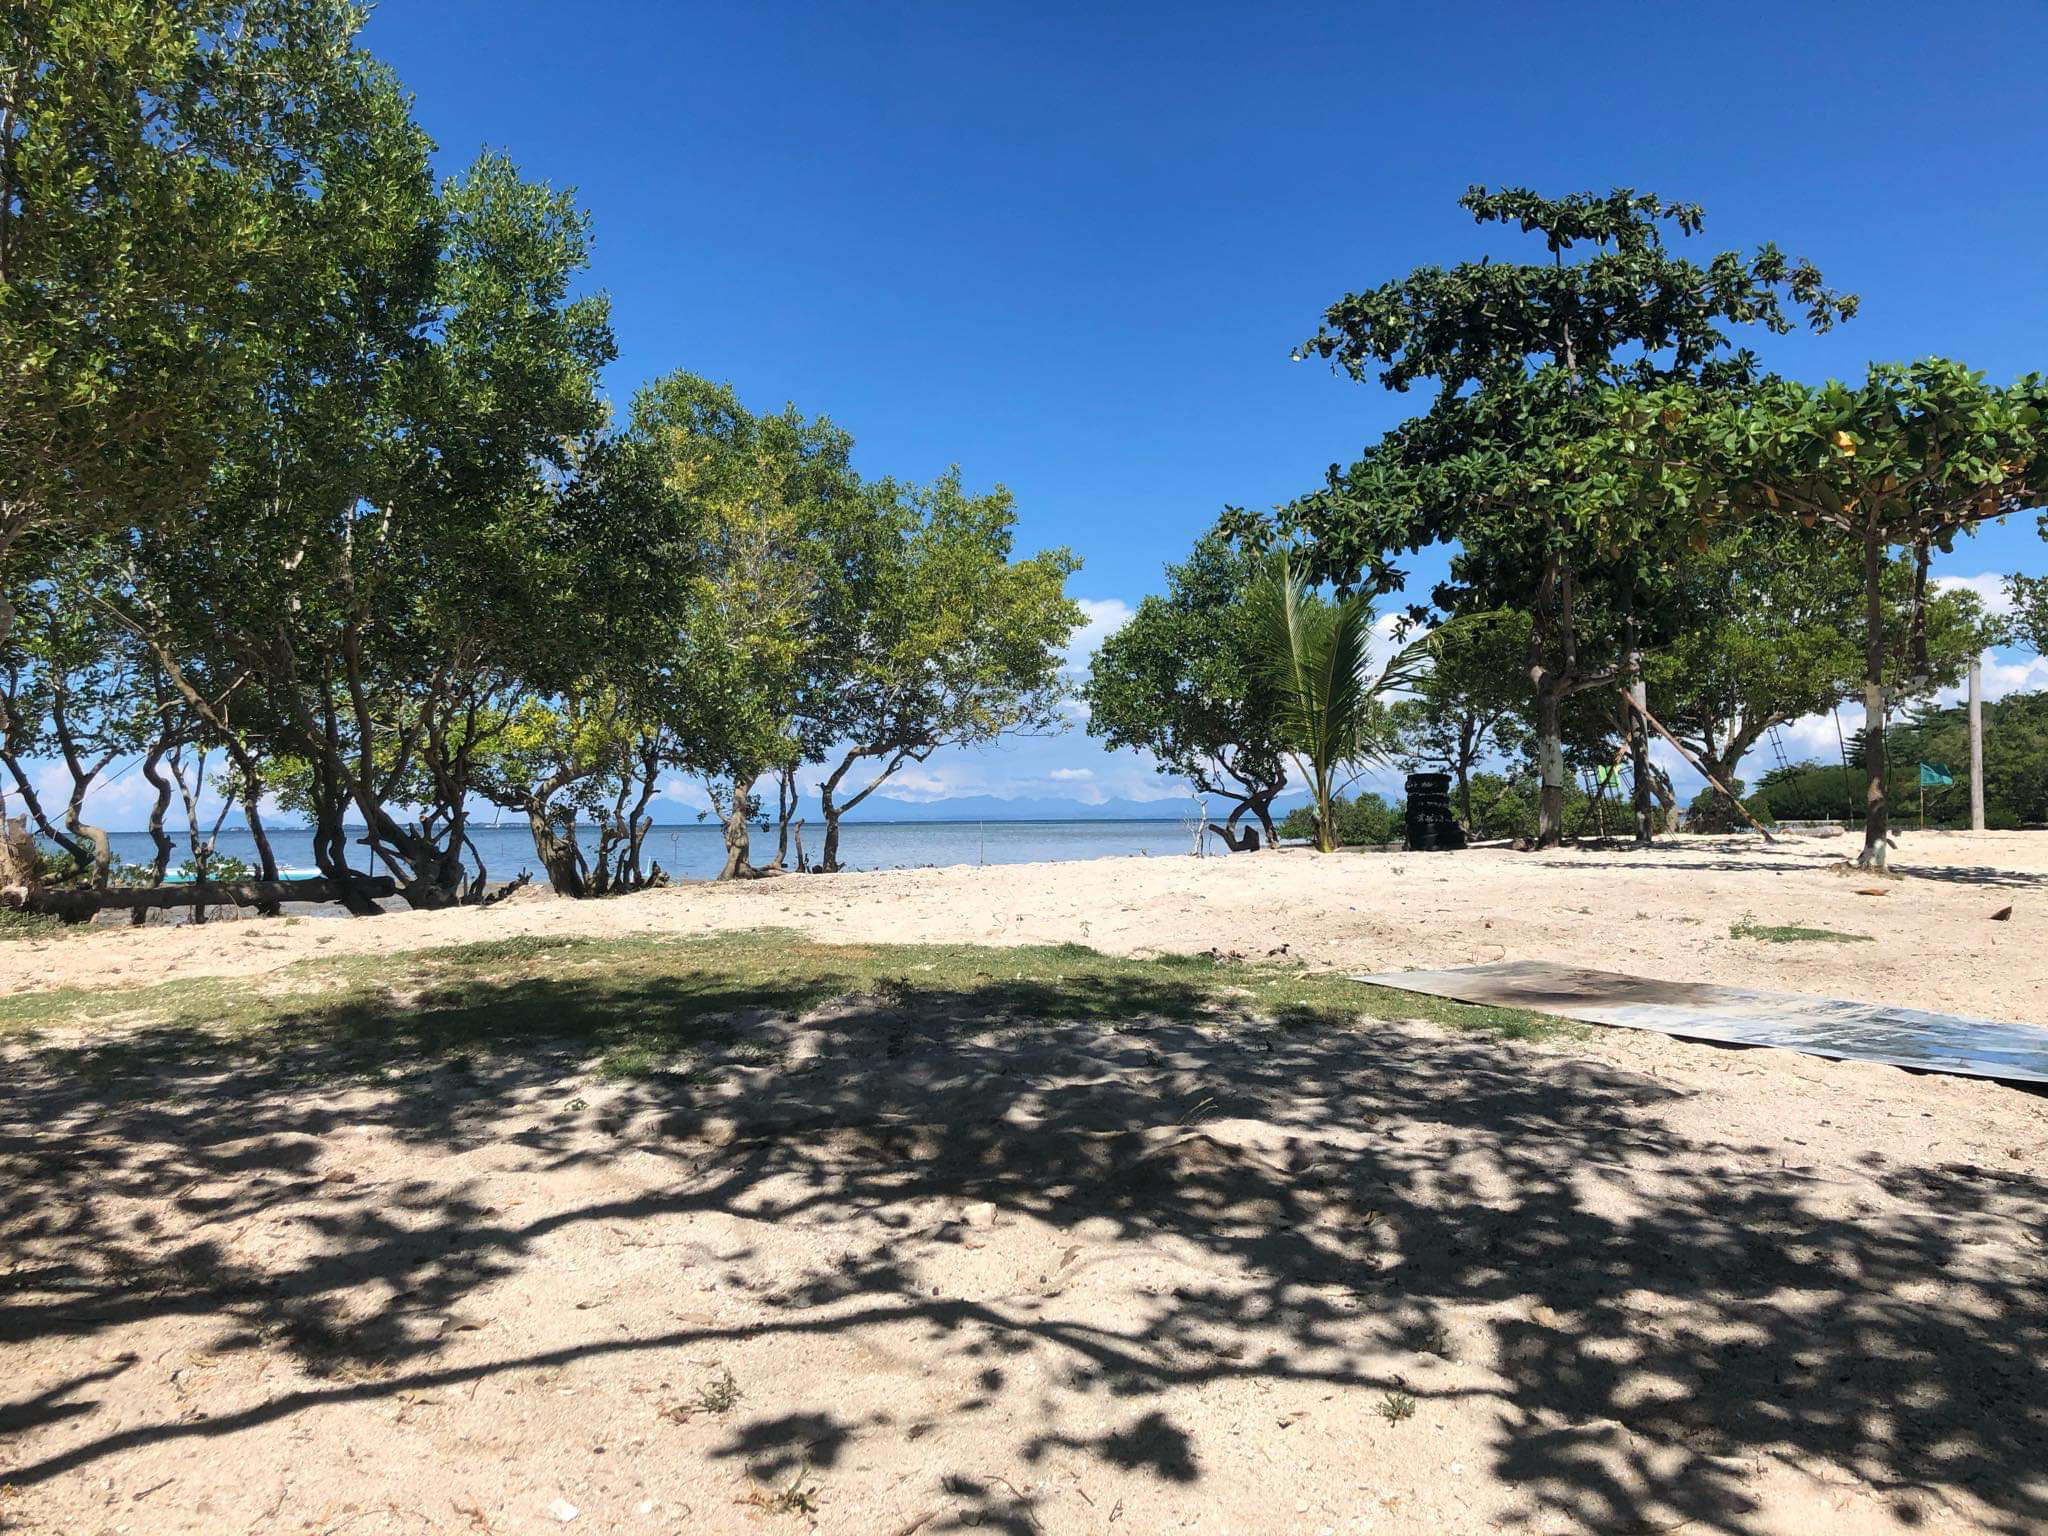 beachfront-property-for-sale-daanbantayan-island-2020-beach-view-1